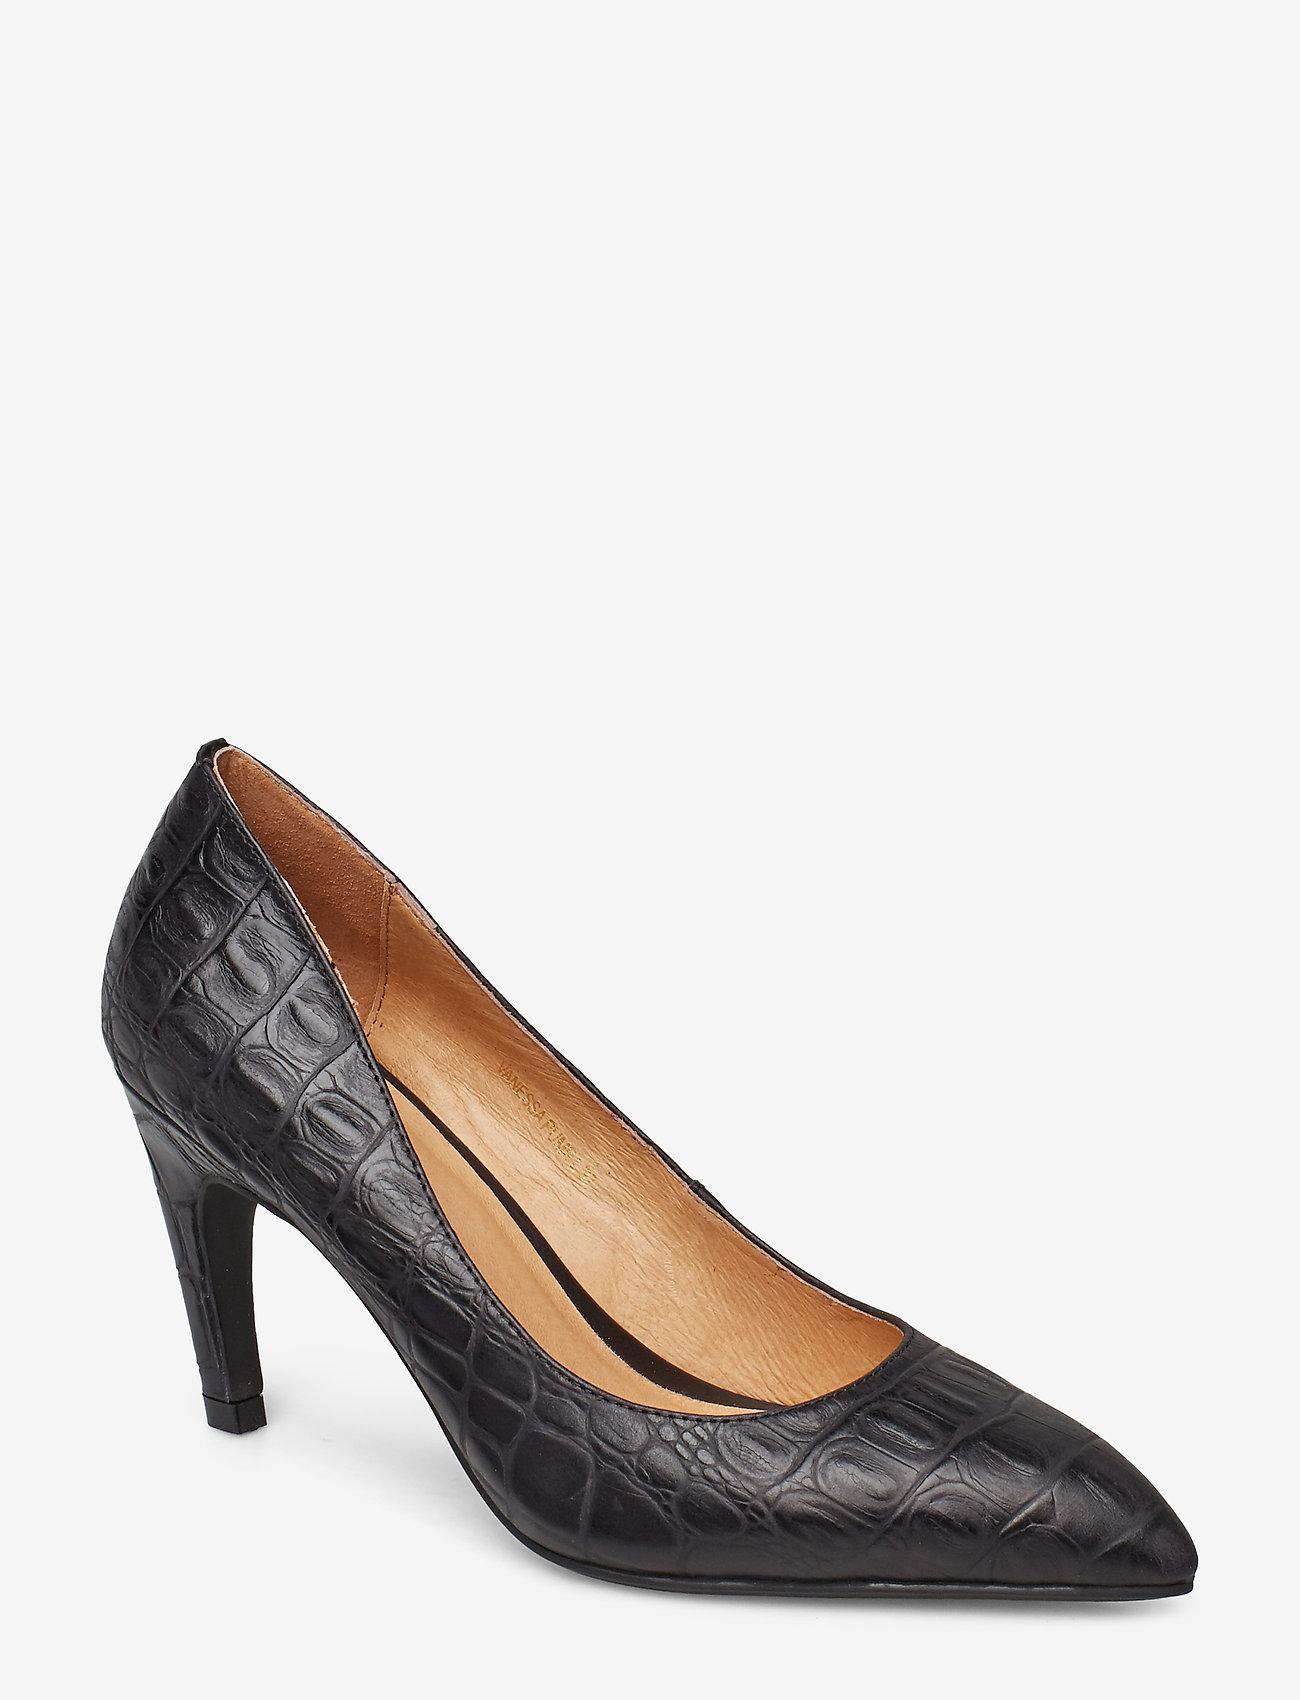 Shoe The Bear - VANESSA PUMP L - klassiset piikkikorkokengät - black croco